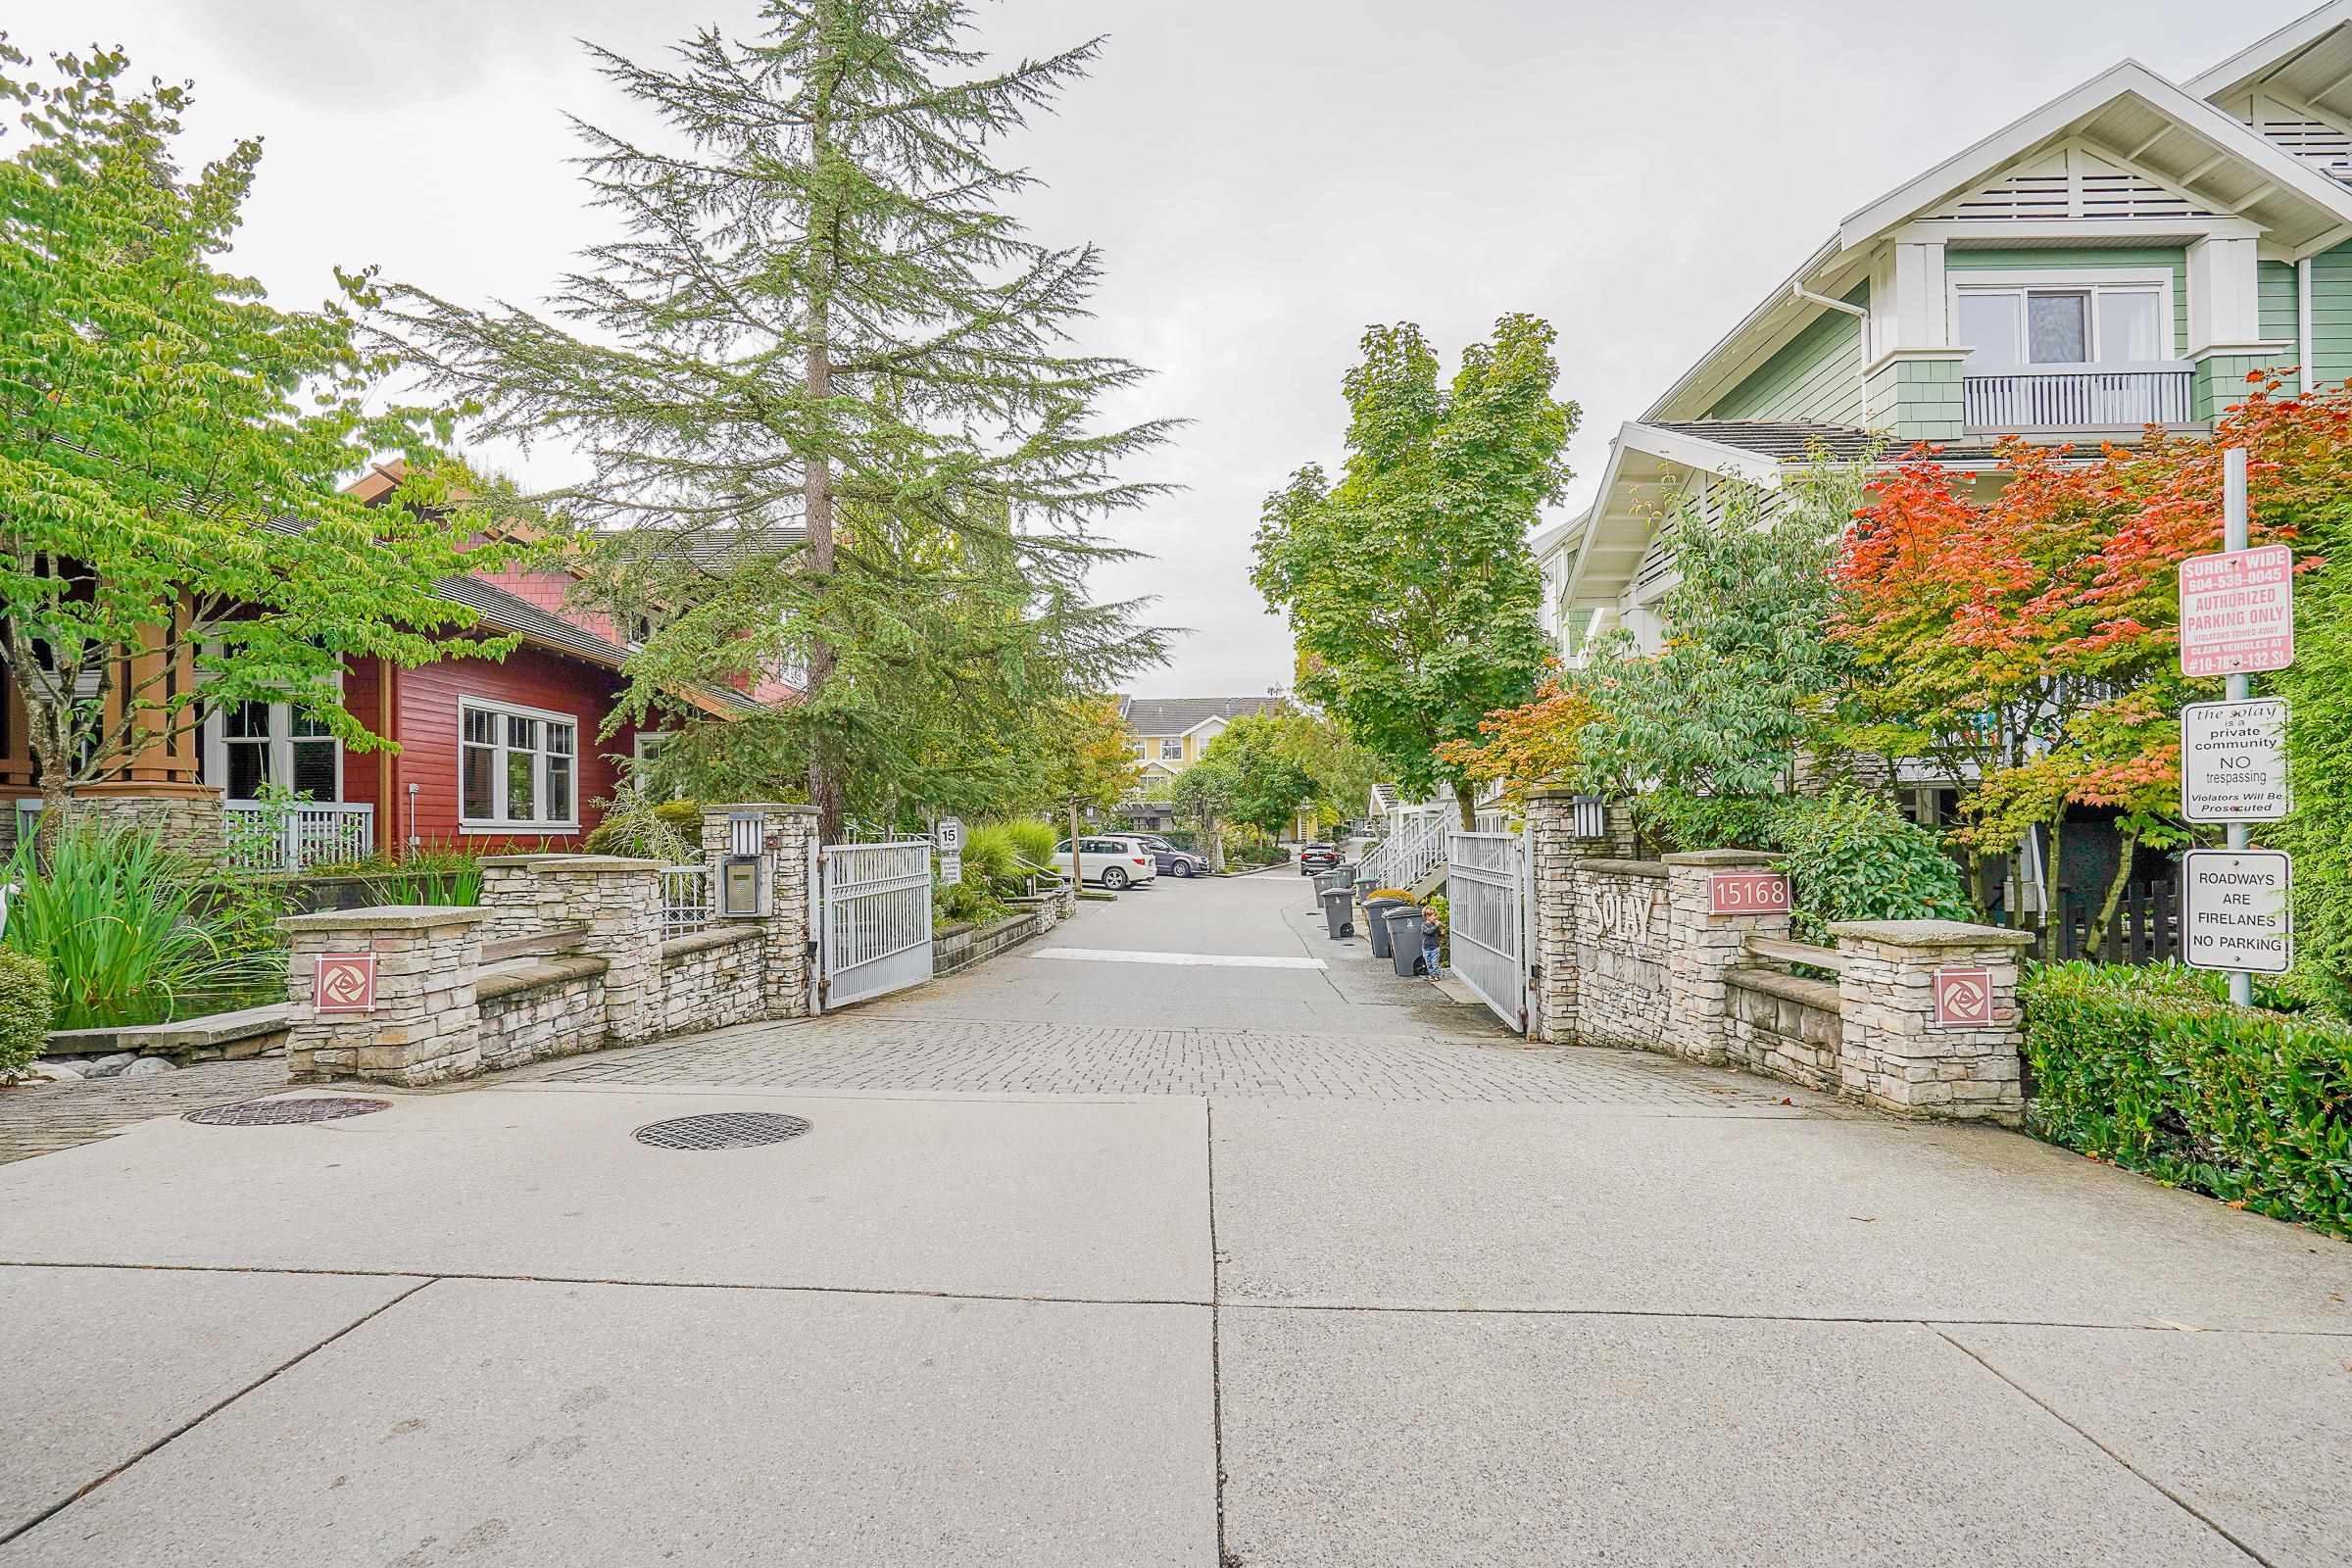 27 15168 36 AVENUE - Morgan Creek Townhouse for sale, 3 Bedrooms (R2620057) - #1